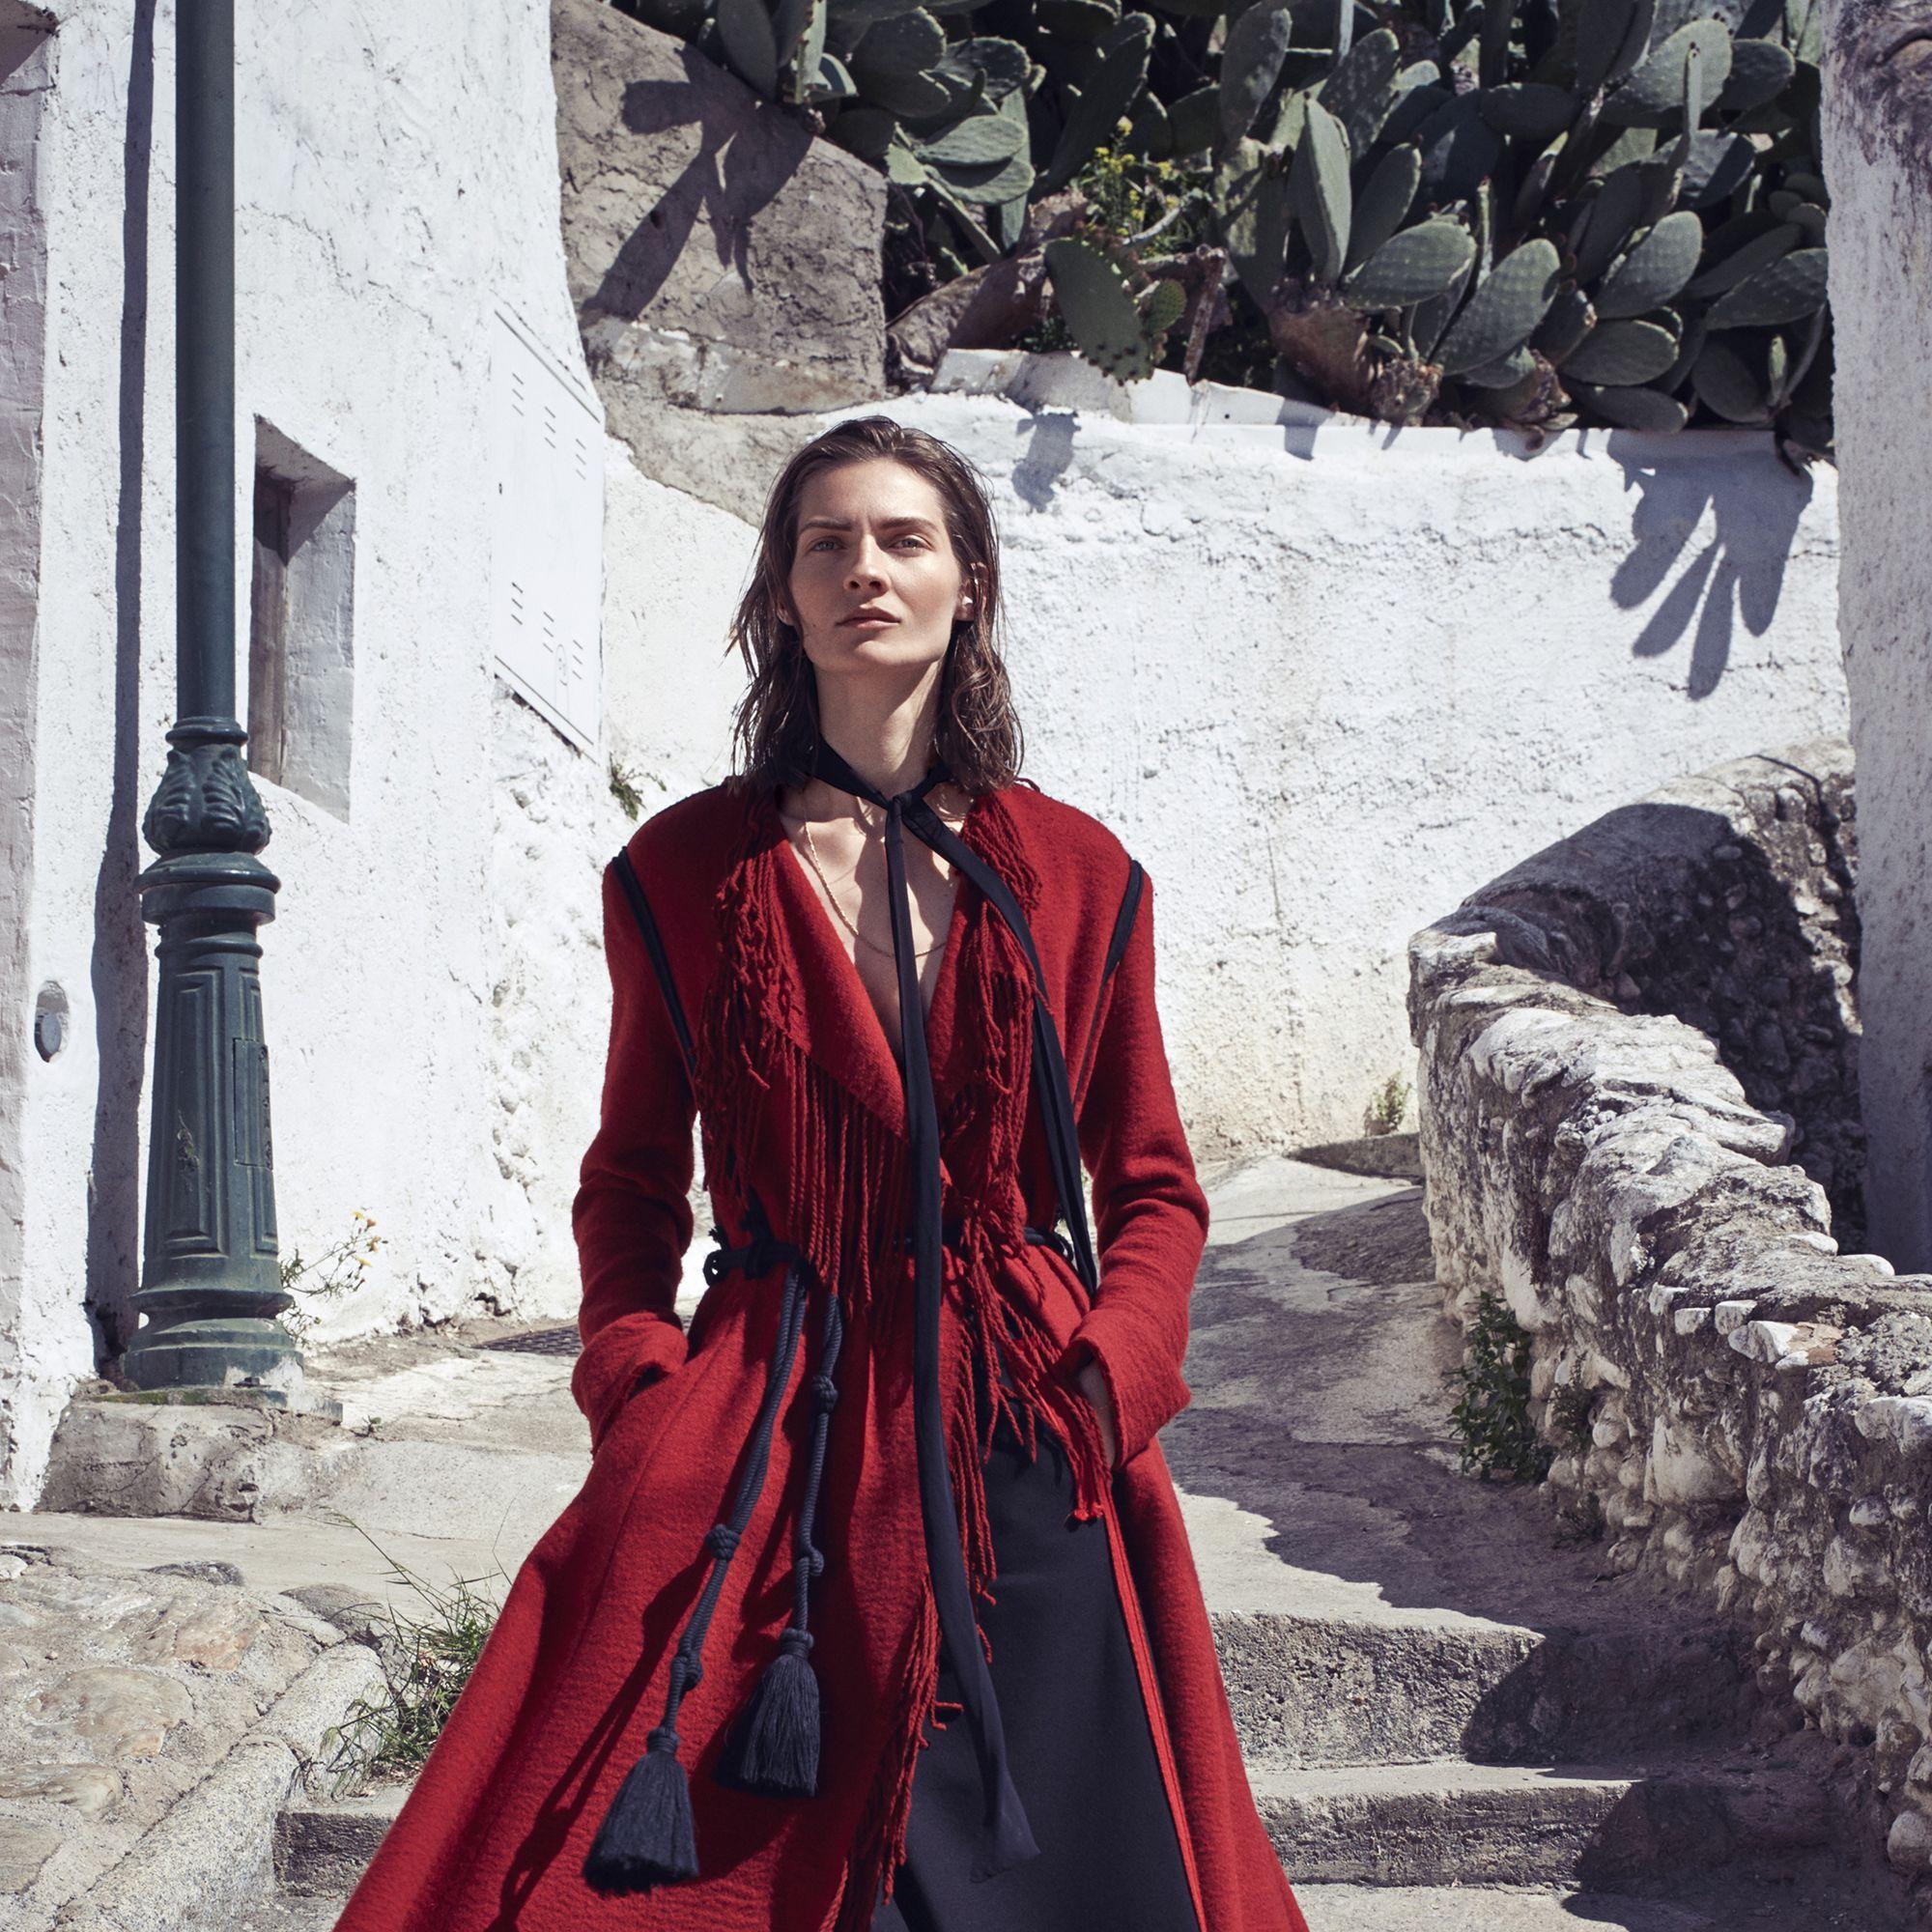 "<p><strong>Lanvin </strong>coat, $4,870, and skirt, $1,965, 646-439-0380&#x3B; <strong>Chloe </strong>scarf, $195, <a href=""http://www.saksfifthavenue.com/Chloe/Women-s-Apparel/shop/_/N-1z12st3Z52flogZ6lvnb8/Ne-6lvnb6?Ns=P_arrivaldate%7C1%7C%7CP_306418048_sort%7C%7CP_brandname%7C%7CP_product_code"" target=""_blank"">saks.com</a>&#x3B; <strong>Beladora</strong> necklace, $3,000, <a href=""http://www.beladora.com/"" target=""_blank"">beladora.com</a>&#x3B; <strong>Lanvin </strong>belt, similar styles available at <a href=""https://shop.harpersbazaar.com/designers/lanvin/marina-tassle-belt/"" target=""_blank"">shopBAZAAR.com</a>&#x3B; <strong>Gucci</strong> shoes, $995, <a href=""https://shop.harpersbazaar.com/designers/gucci/fur-lined-slip-on-loafer/"" target=""_blank"">shopBAZAAR.com</a>. </p>"